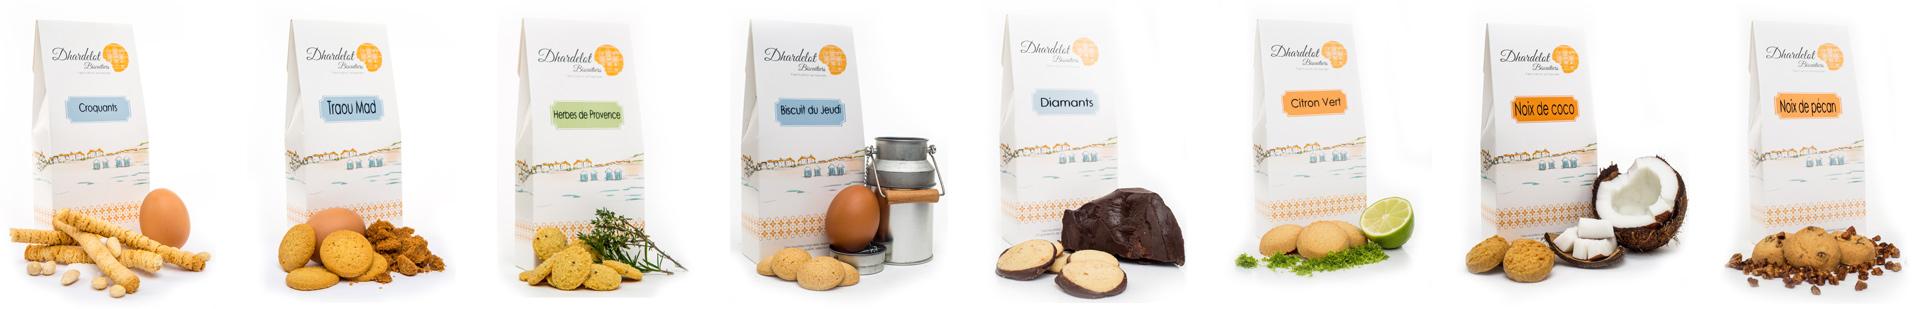 Biscuits Dhardelot